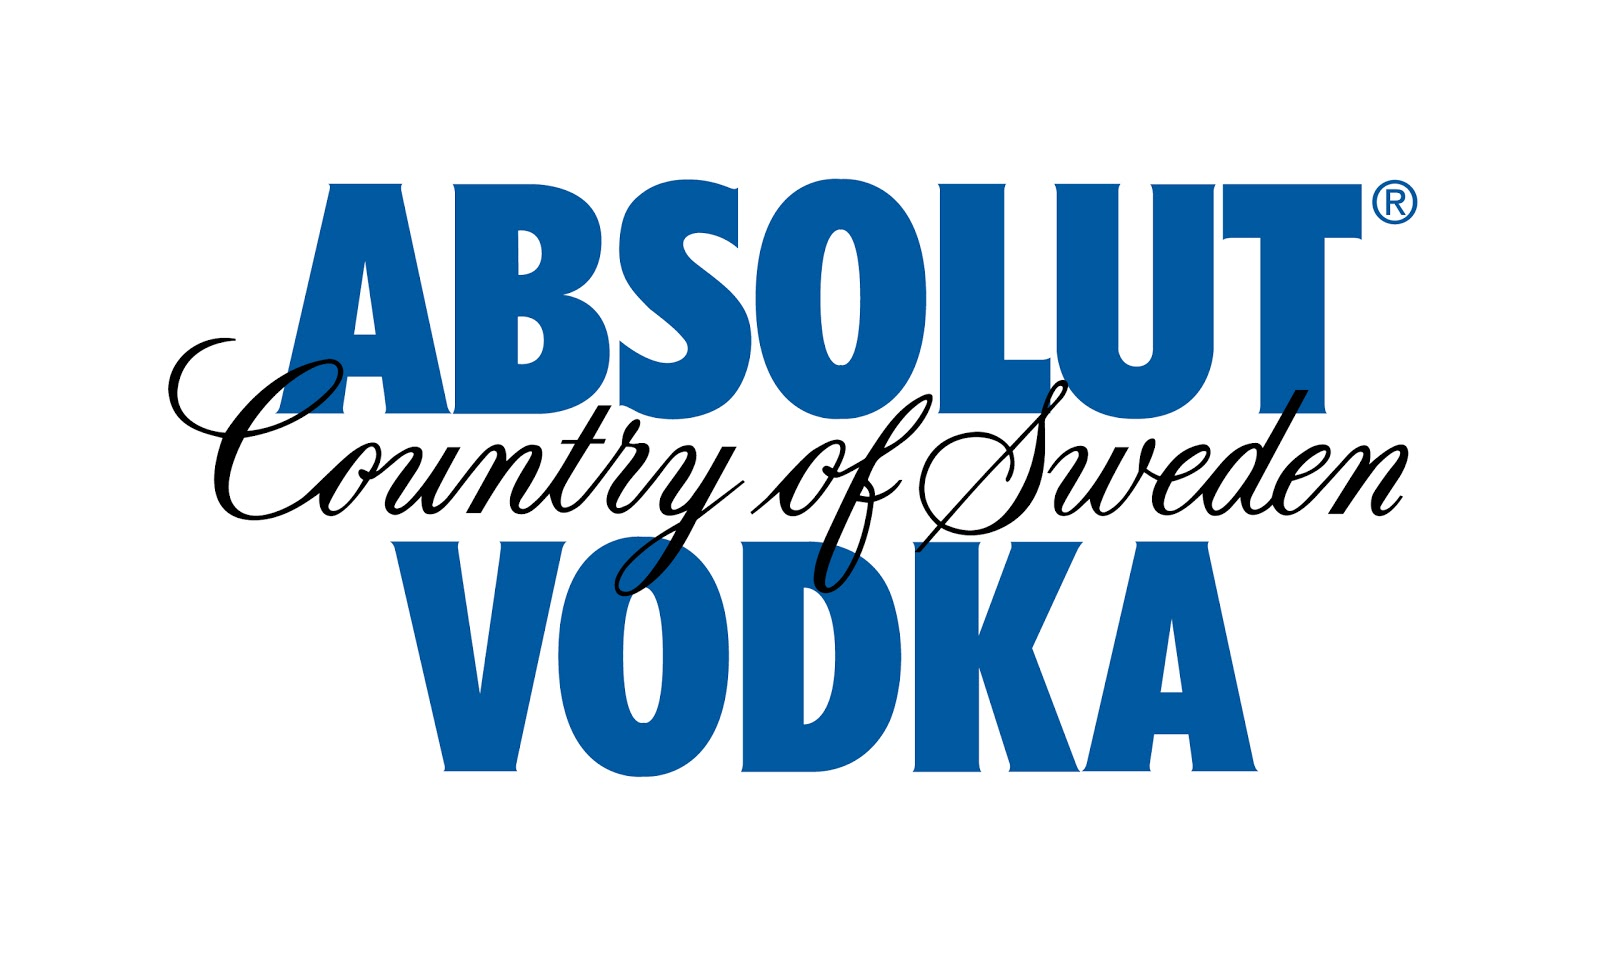 http://1.bp.blogspot.com/-rSnr3nM6zW4/TV-hKU8aCqI/AAAAAAAAJ0k/he9Blfmigks/s1600/Absolut_Vodka_logo1.jpg